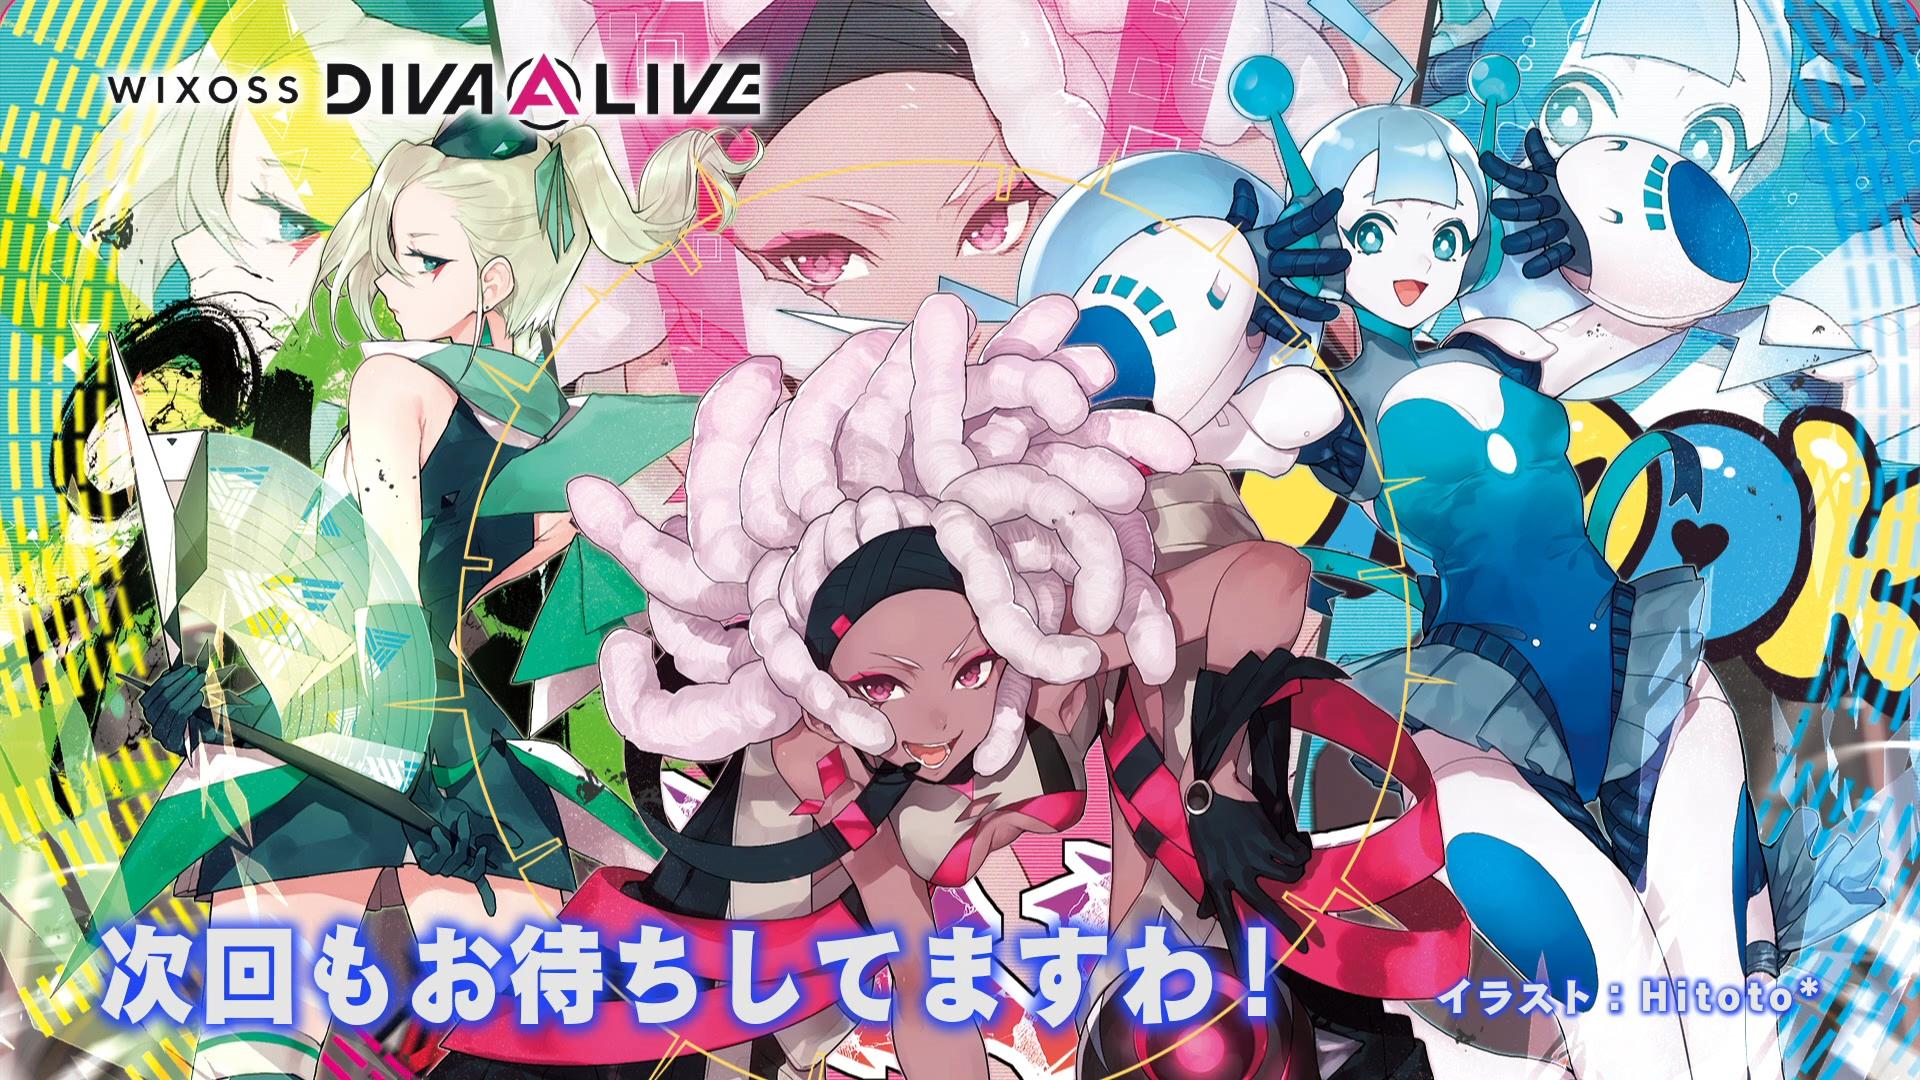 WIXOSS Diva(A)Live Episode 06 Hitoto